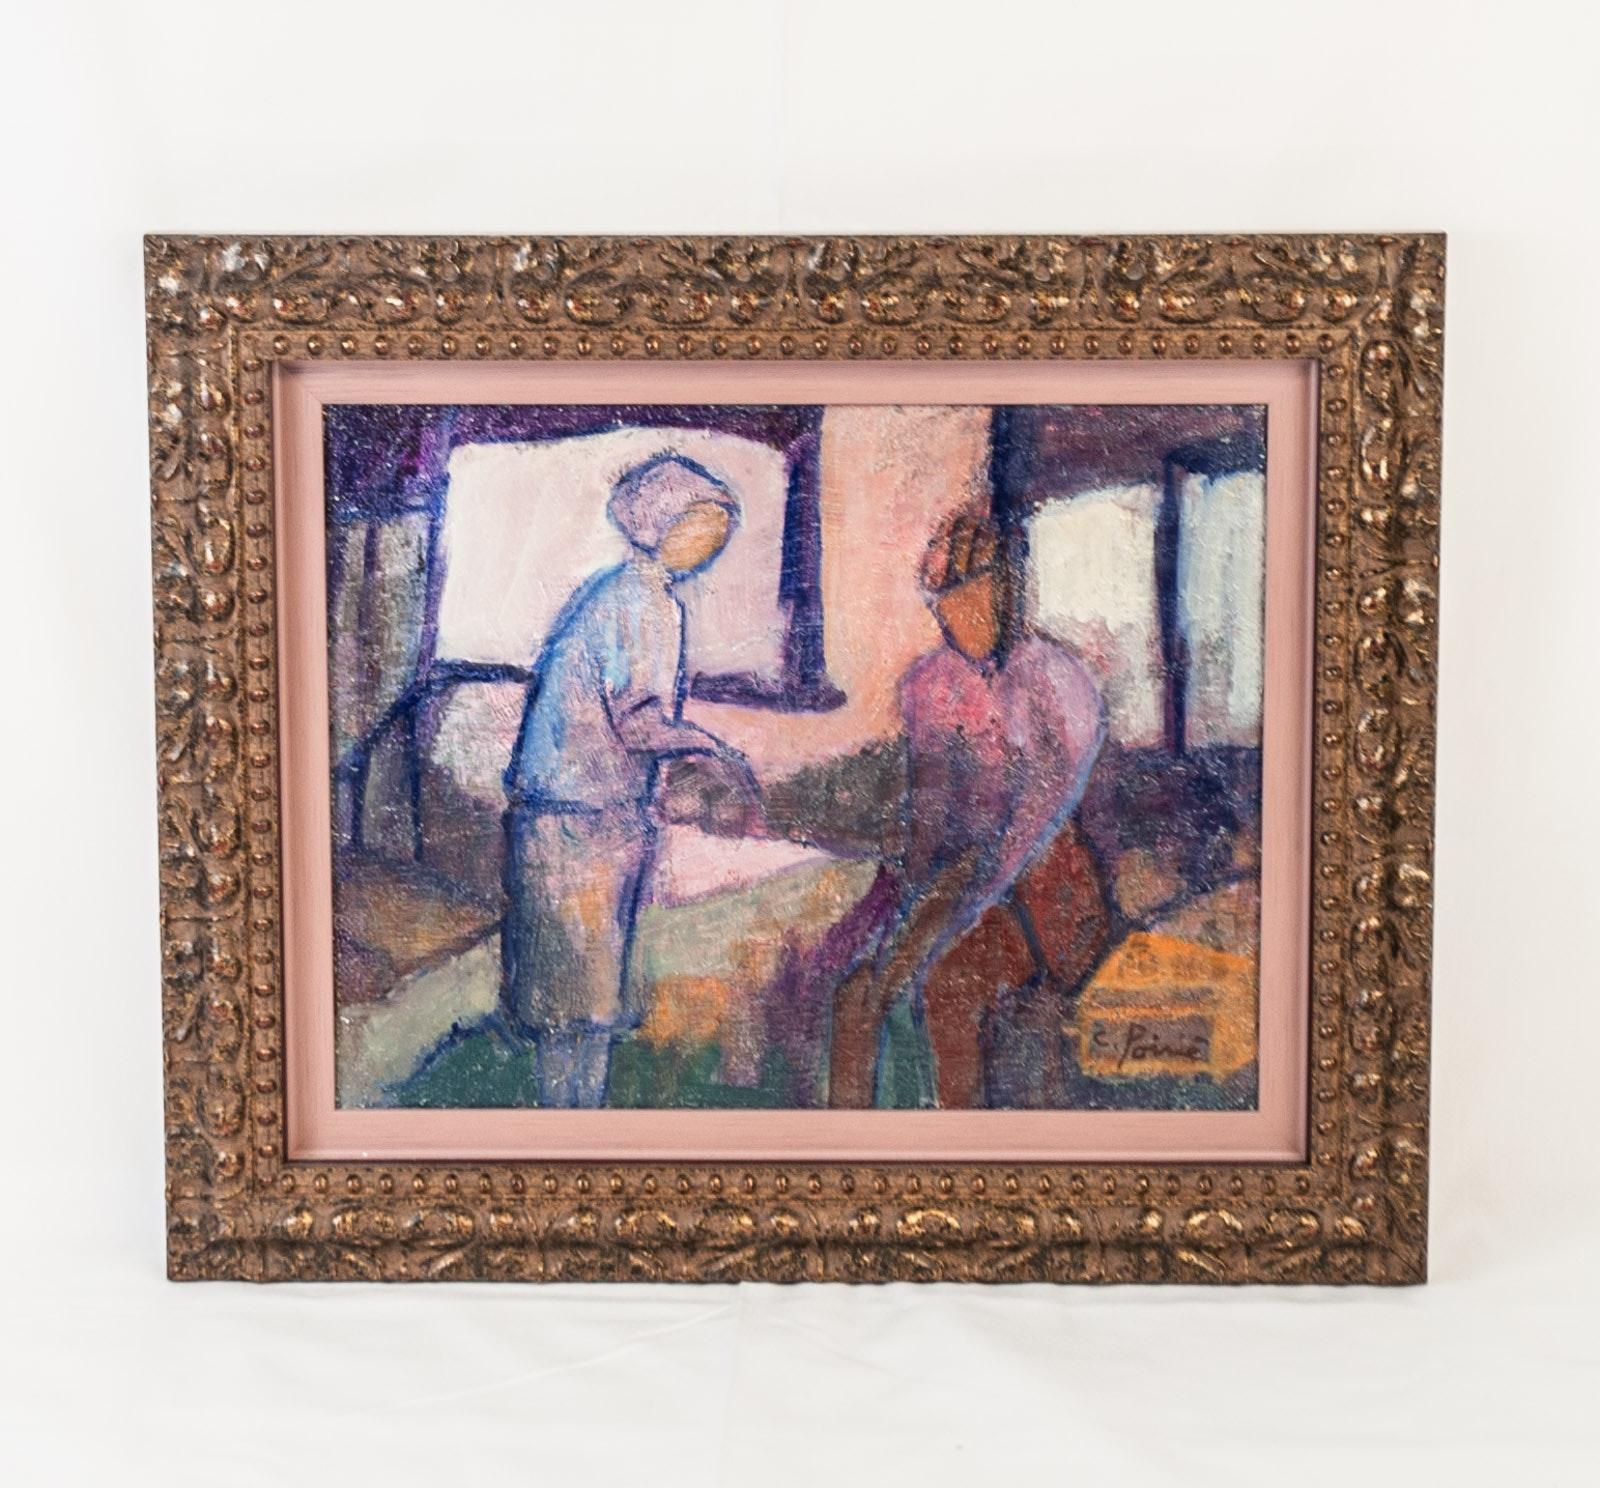 C. Poirié Modernist Oil Painting on Canvas Board